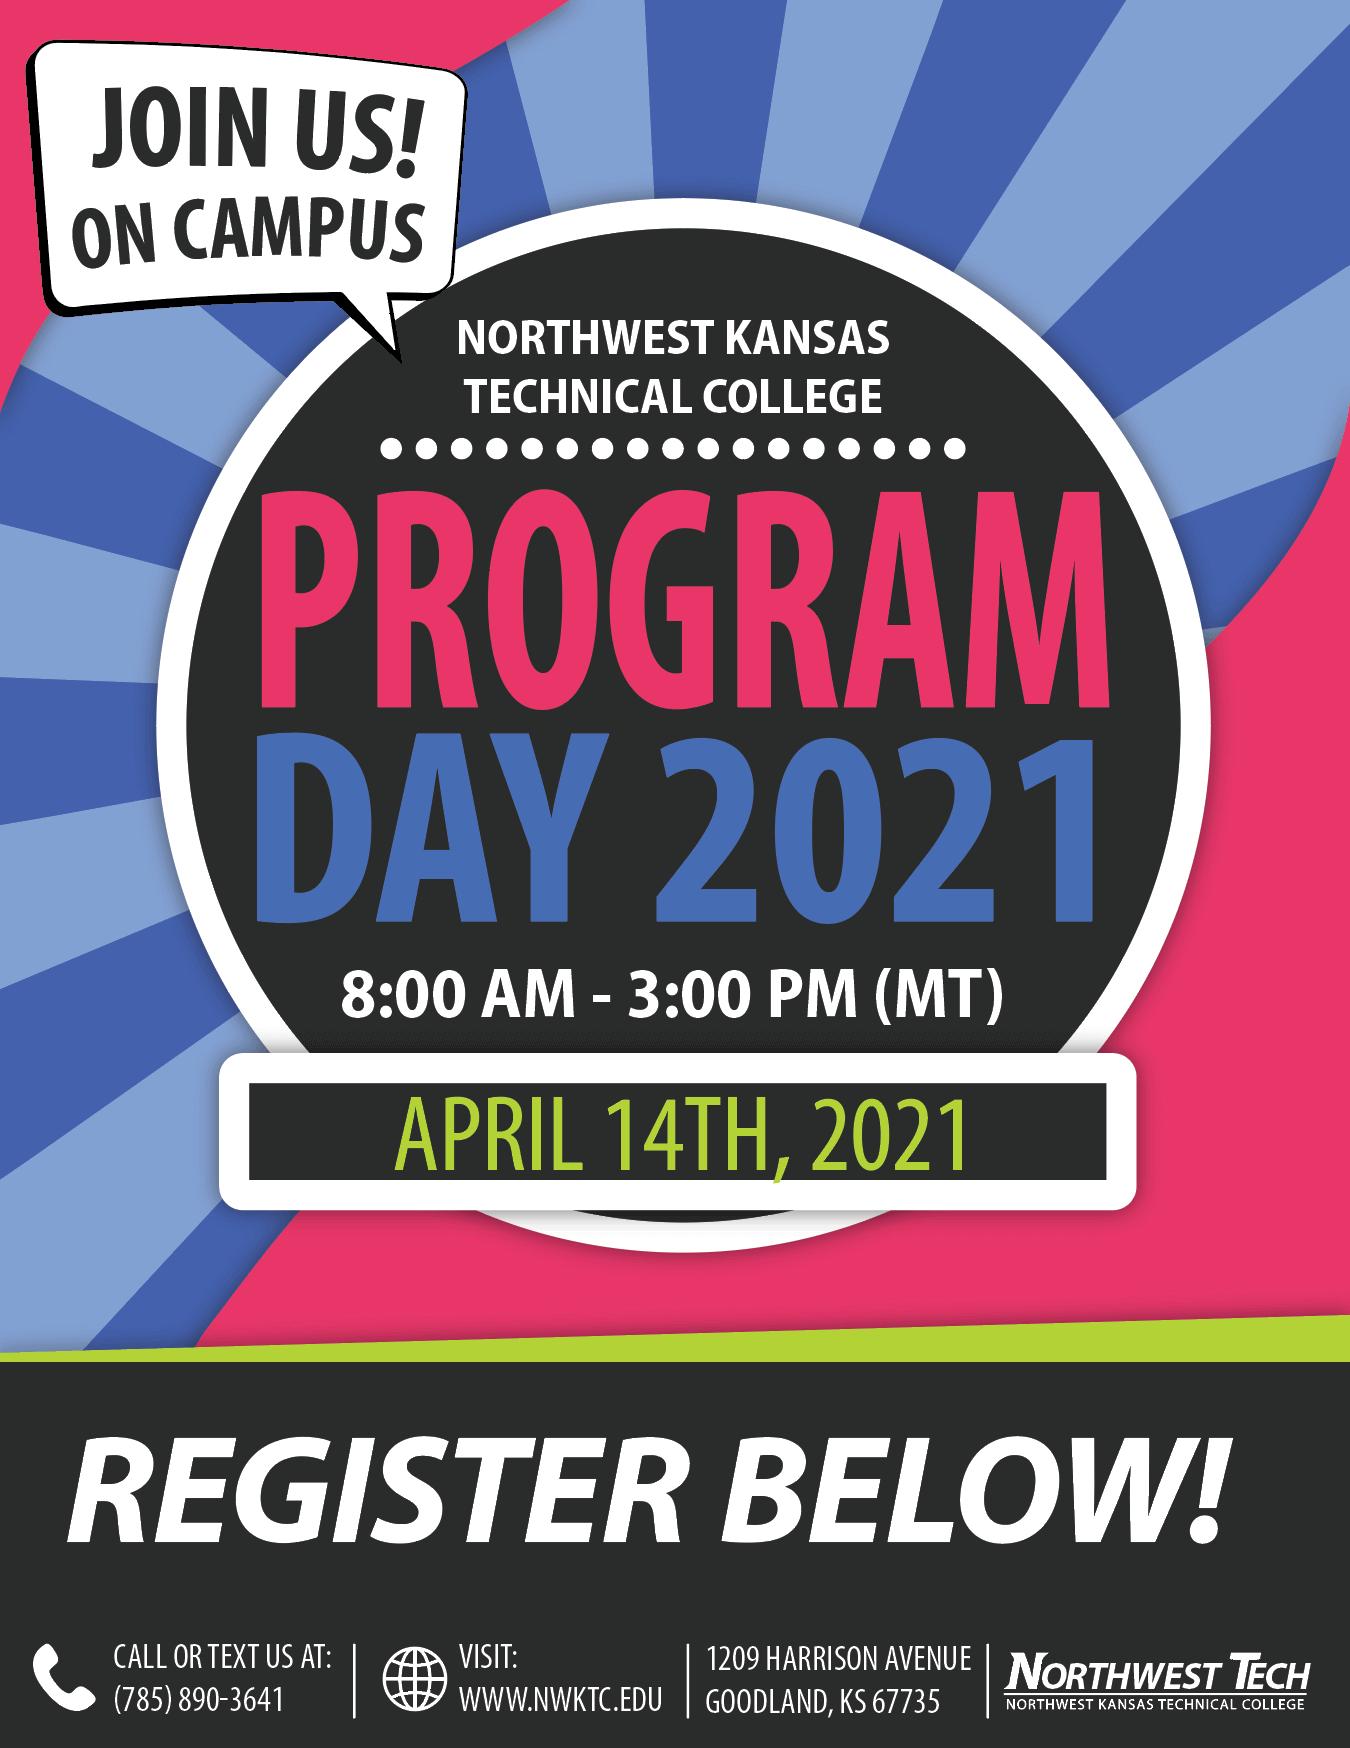 Program Day 2021